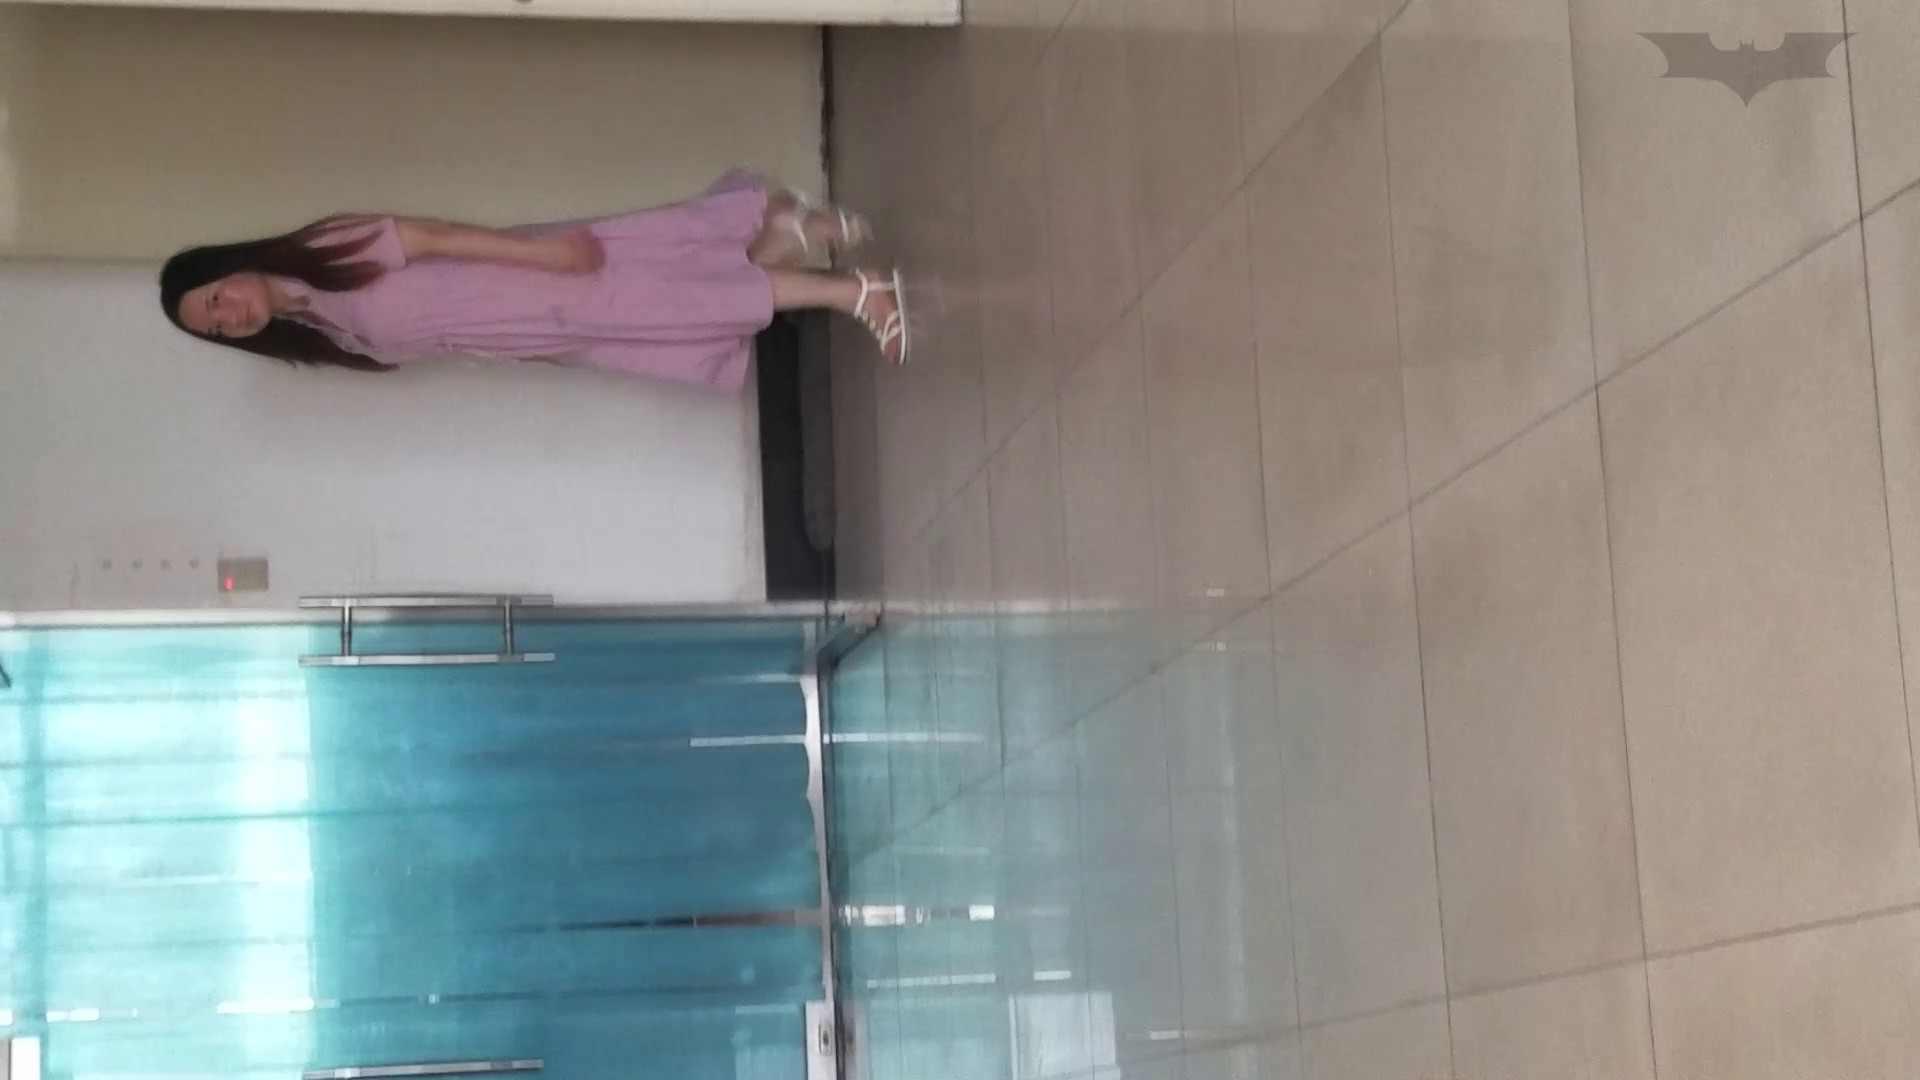 JD盗撮 美女の洗面所の秘密 Vol.70 美肌 ワレメ無修正動画無料 89画像 81